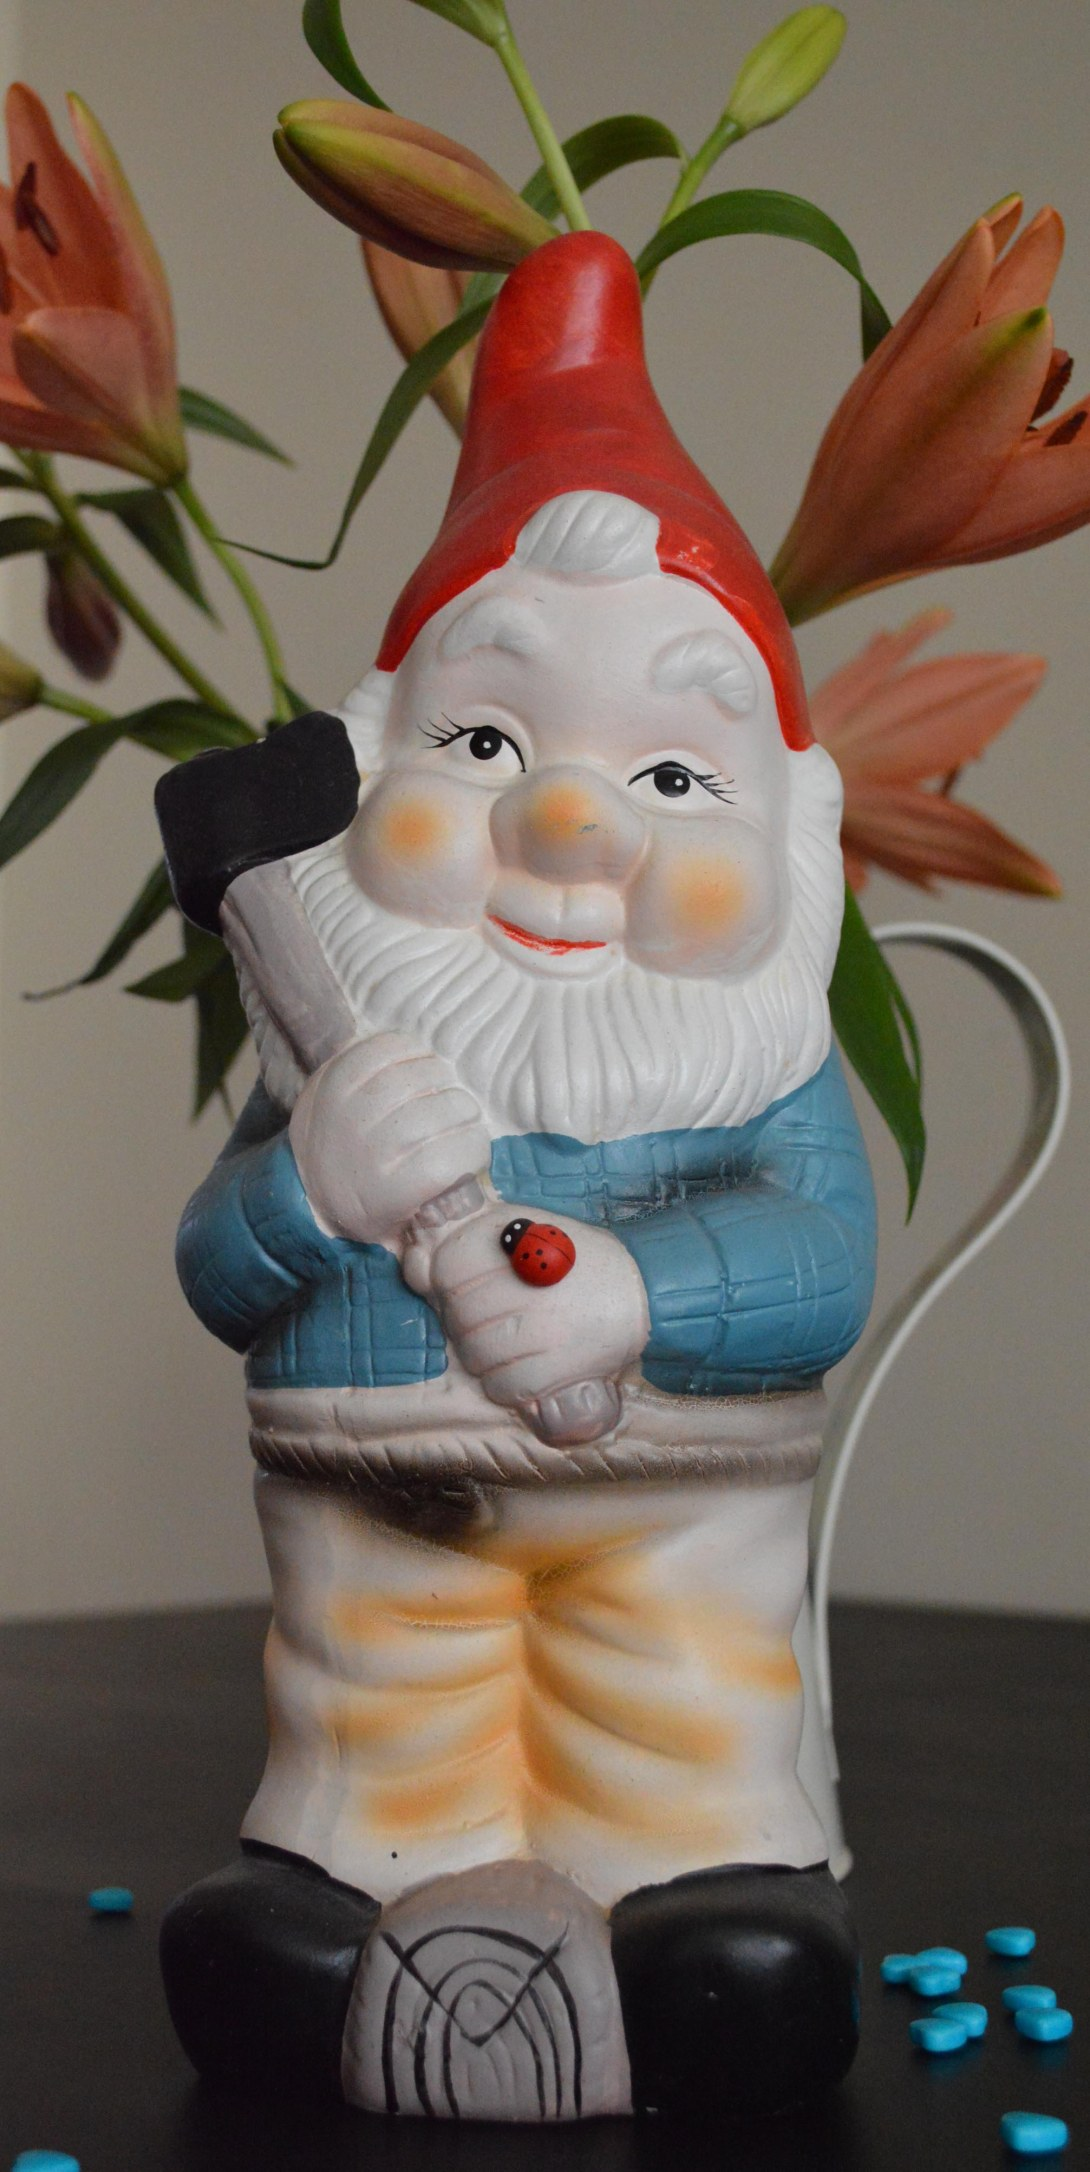 #garden gnome #gartenzwerg be kitschig blog berlin #gnomevember